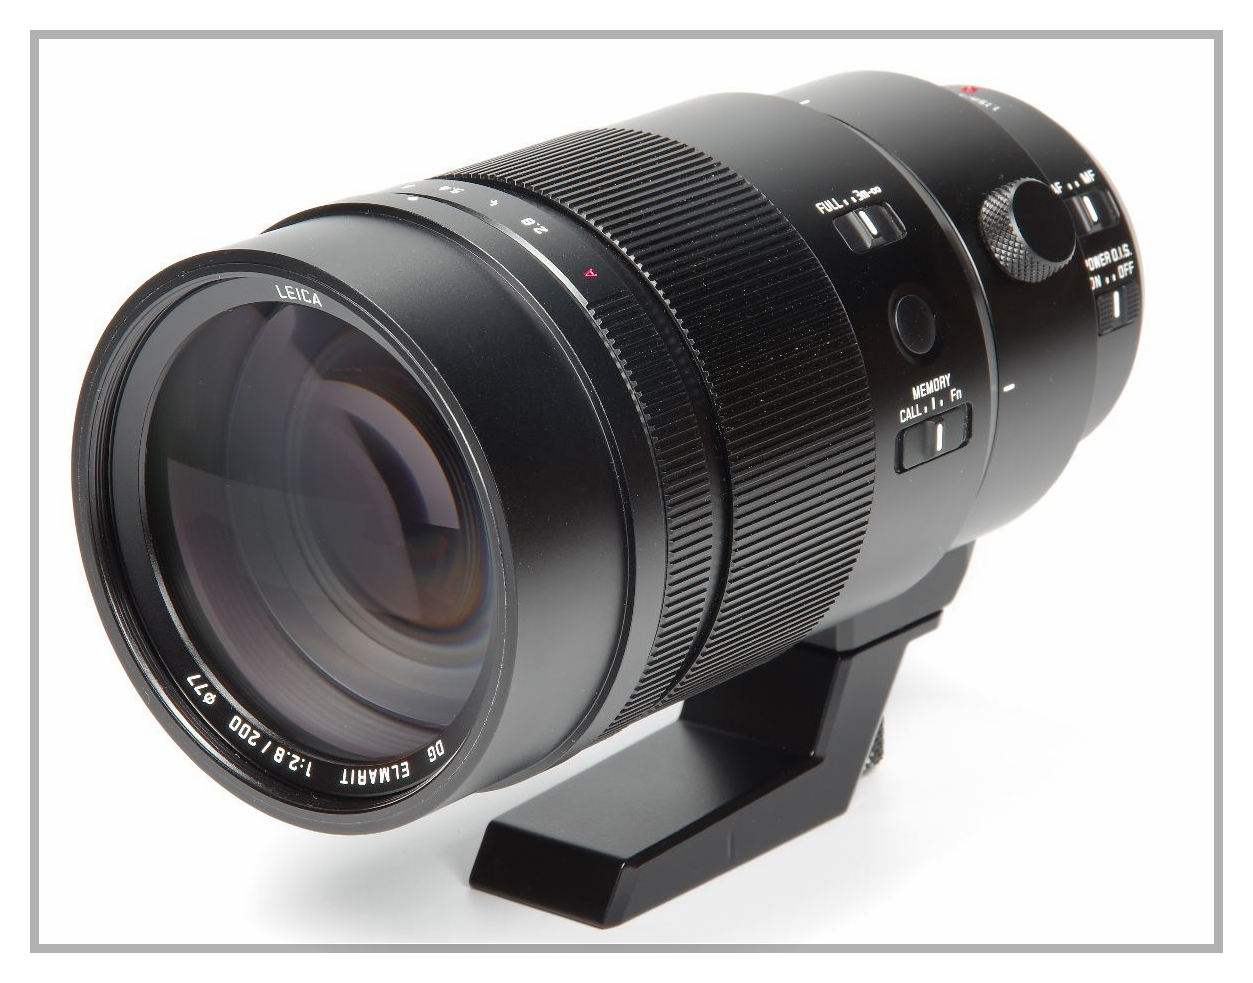 Panasonic Leica DG Elmarit 200 f2.8 Power OIS